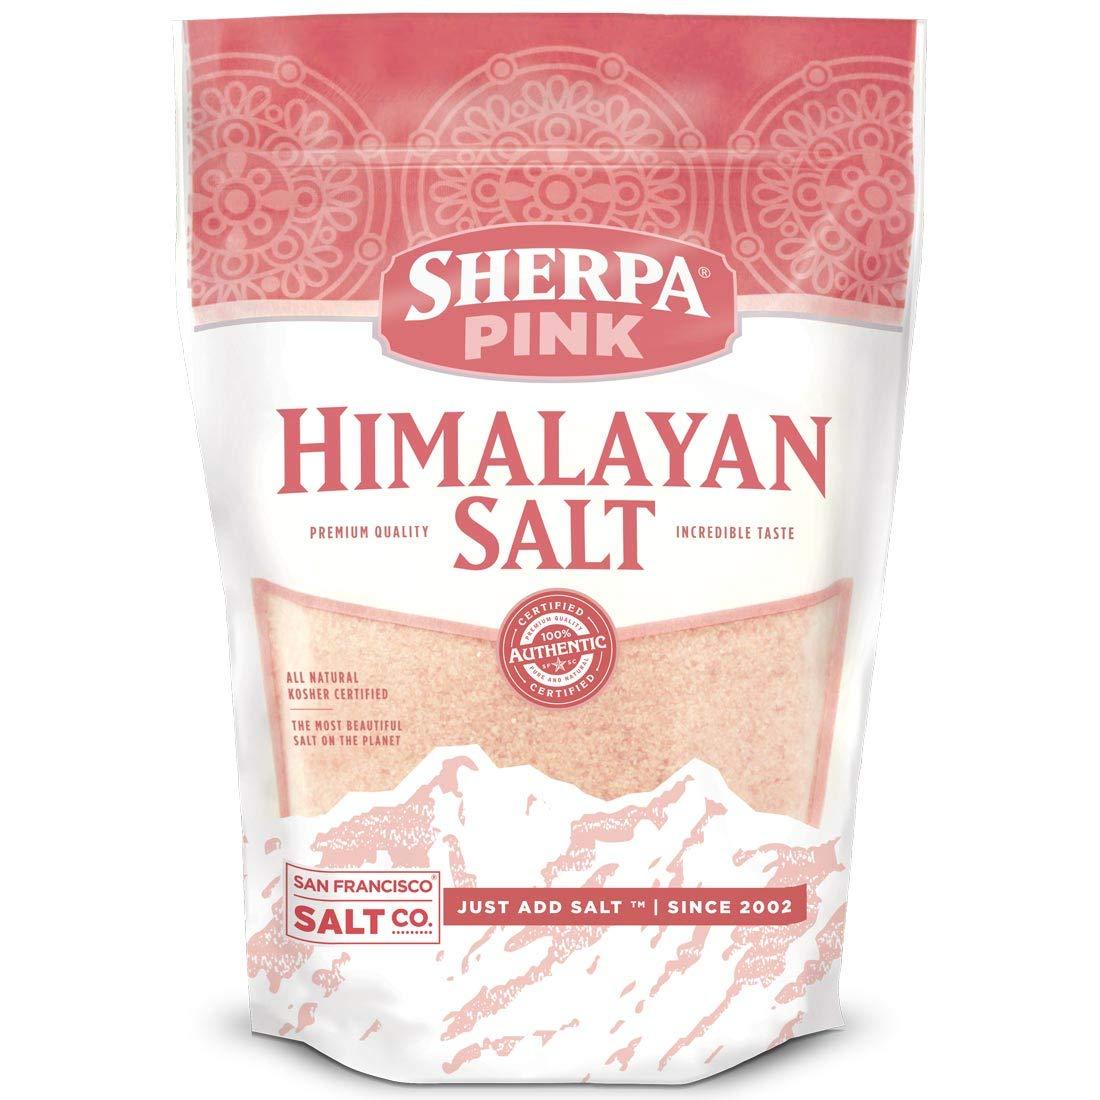 Sherpa Pink Gourmet Himalayan Salt - 2 lbs. Fine Grain by Sherpa Pink (Image #1)